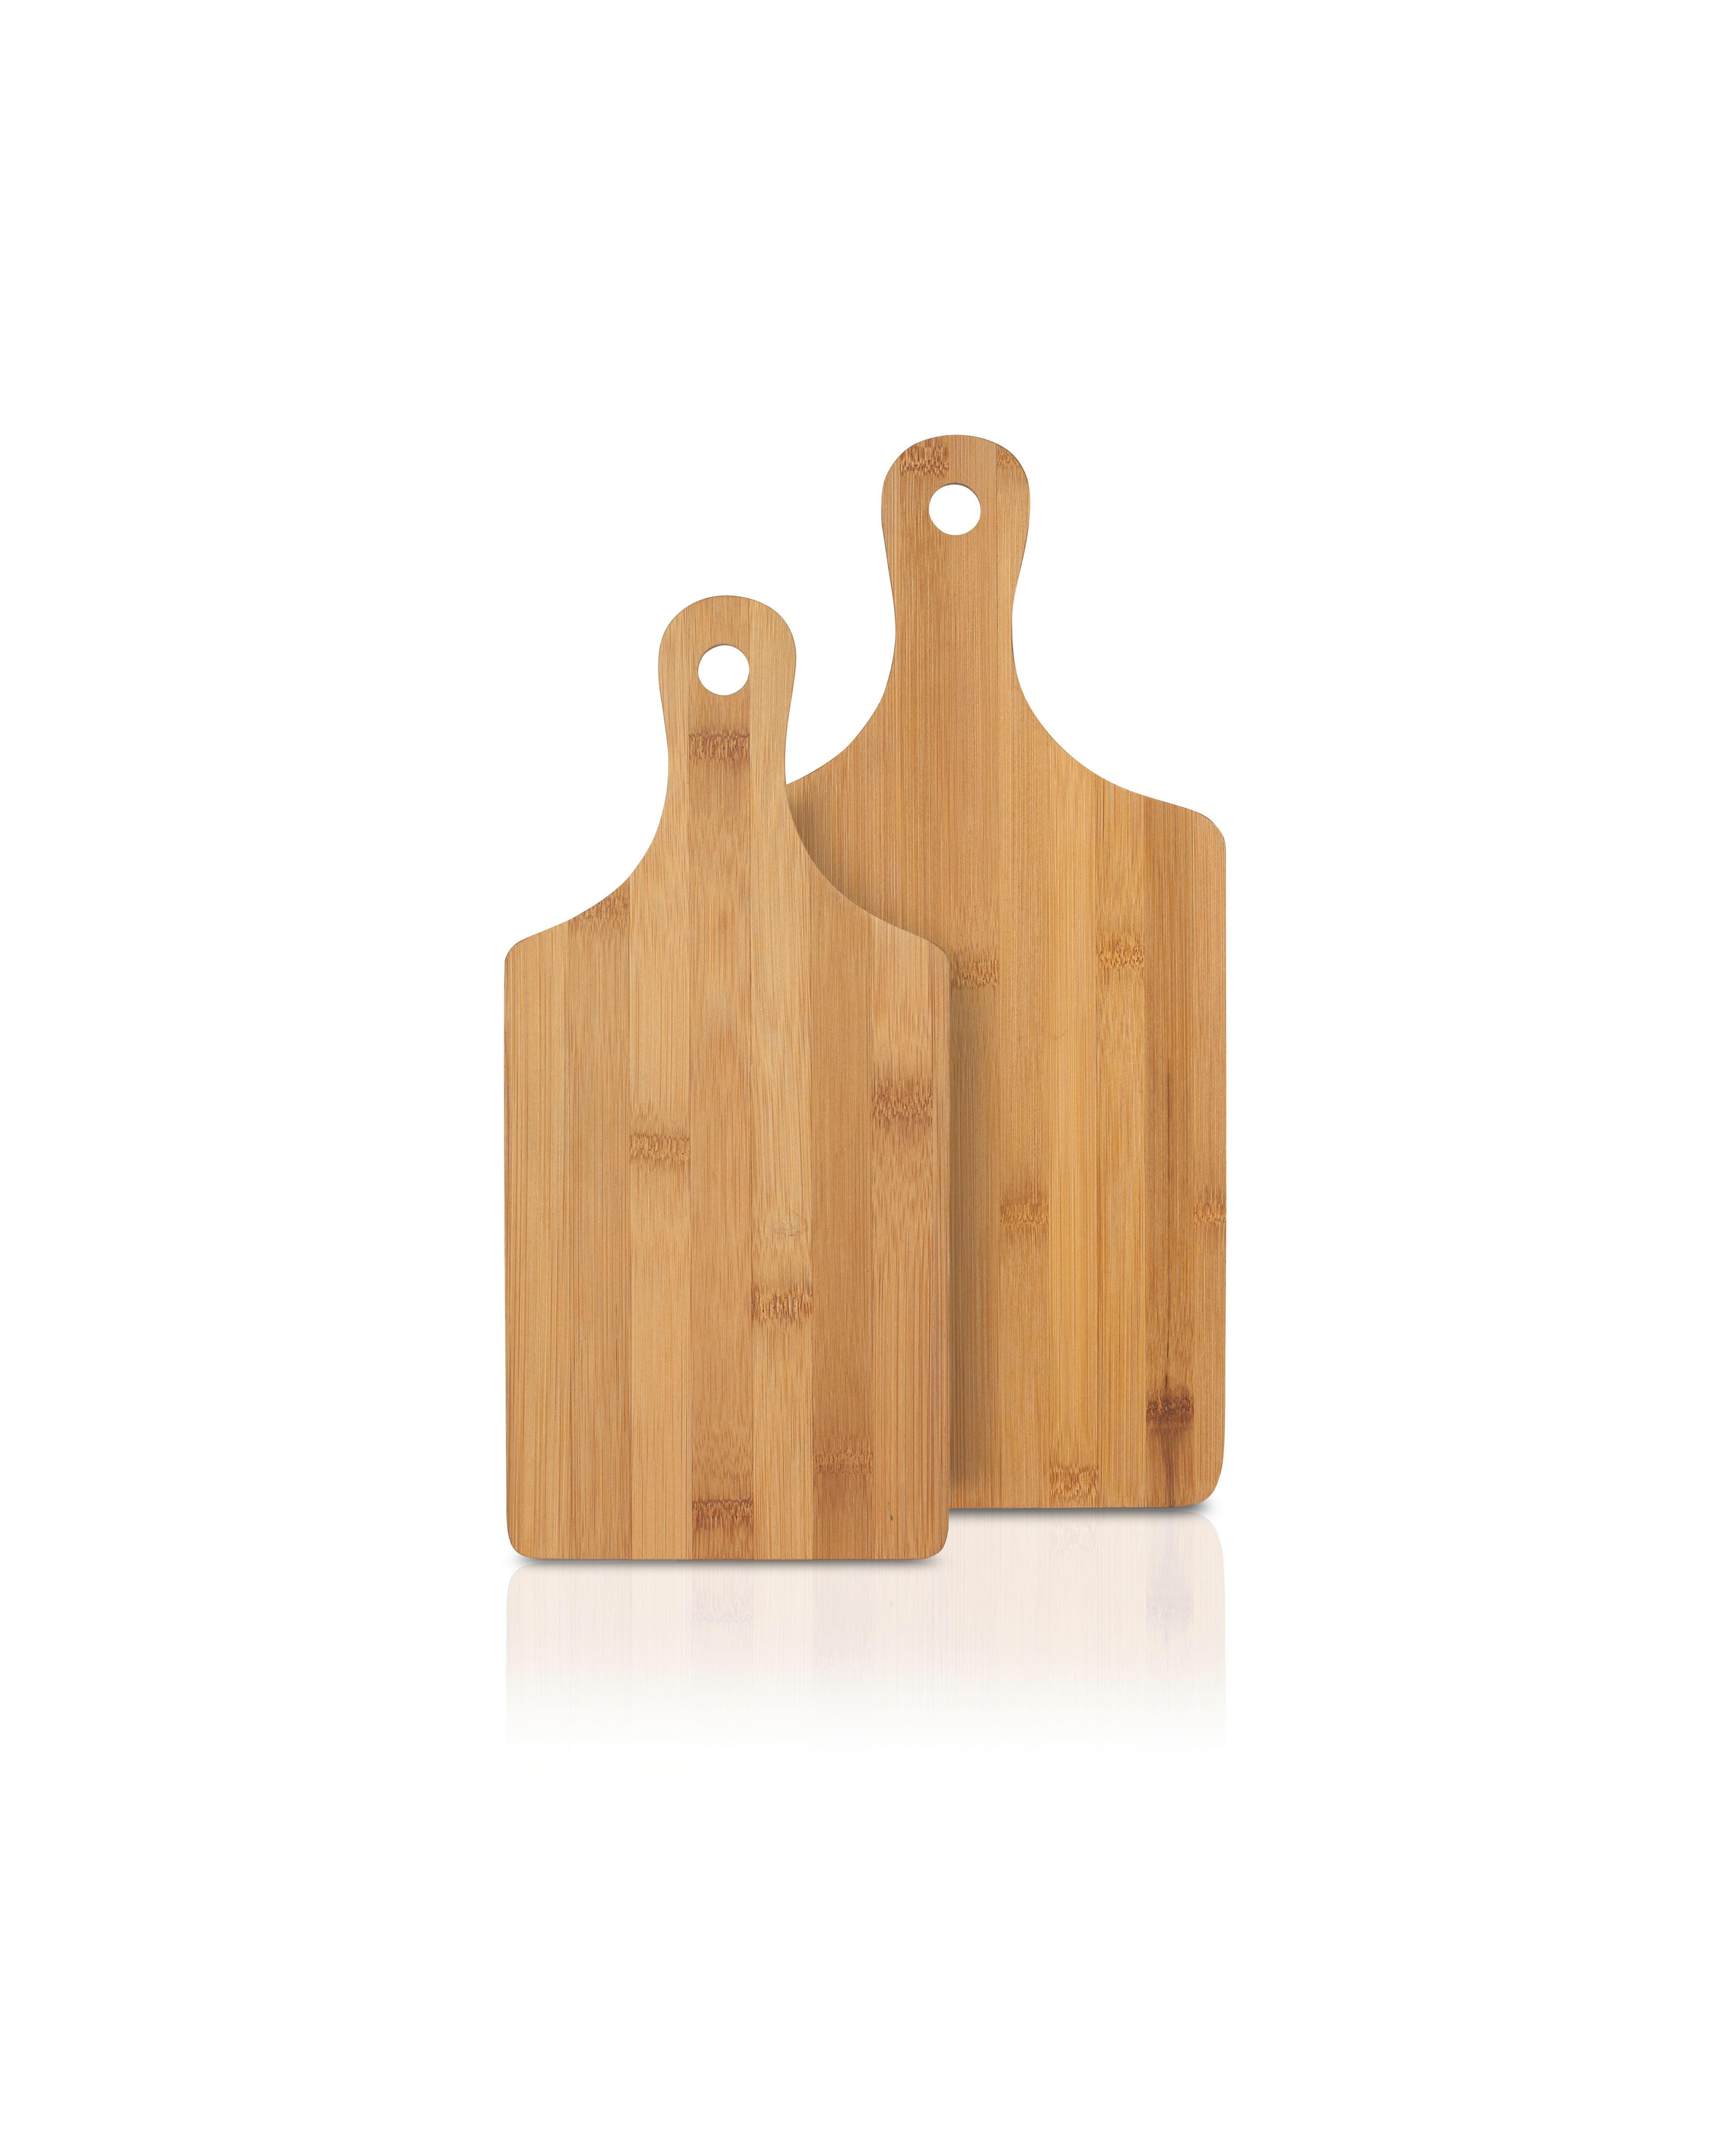 SCHNEIDEBRETT 39/20/0,8 cm - Naturfarben, Basics, Holz (39/20/0,8cm) - HOMEWARE